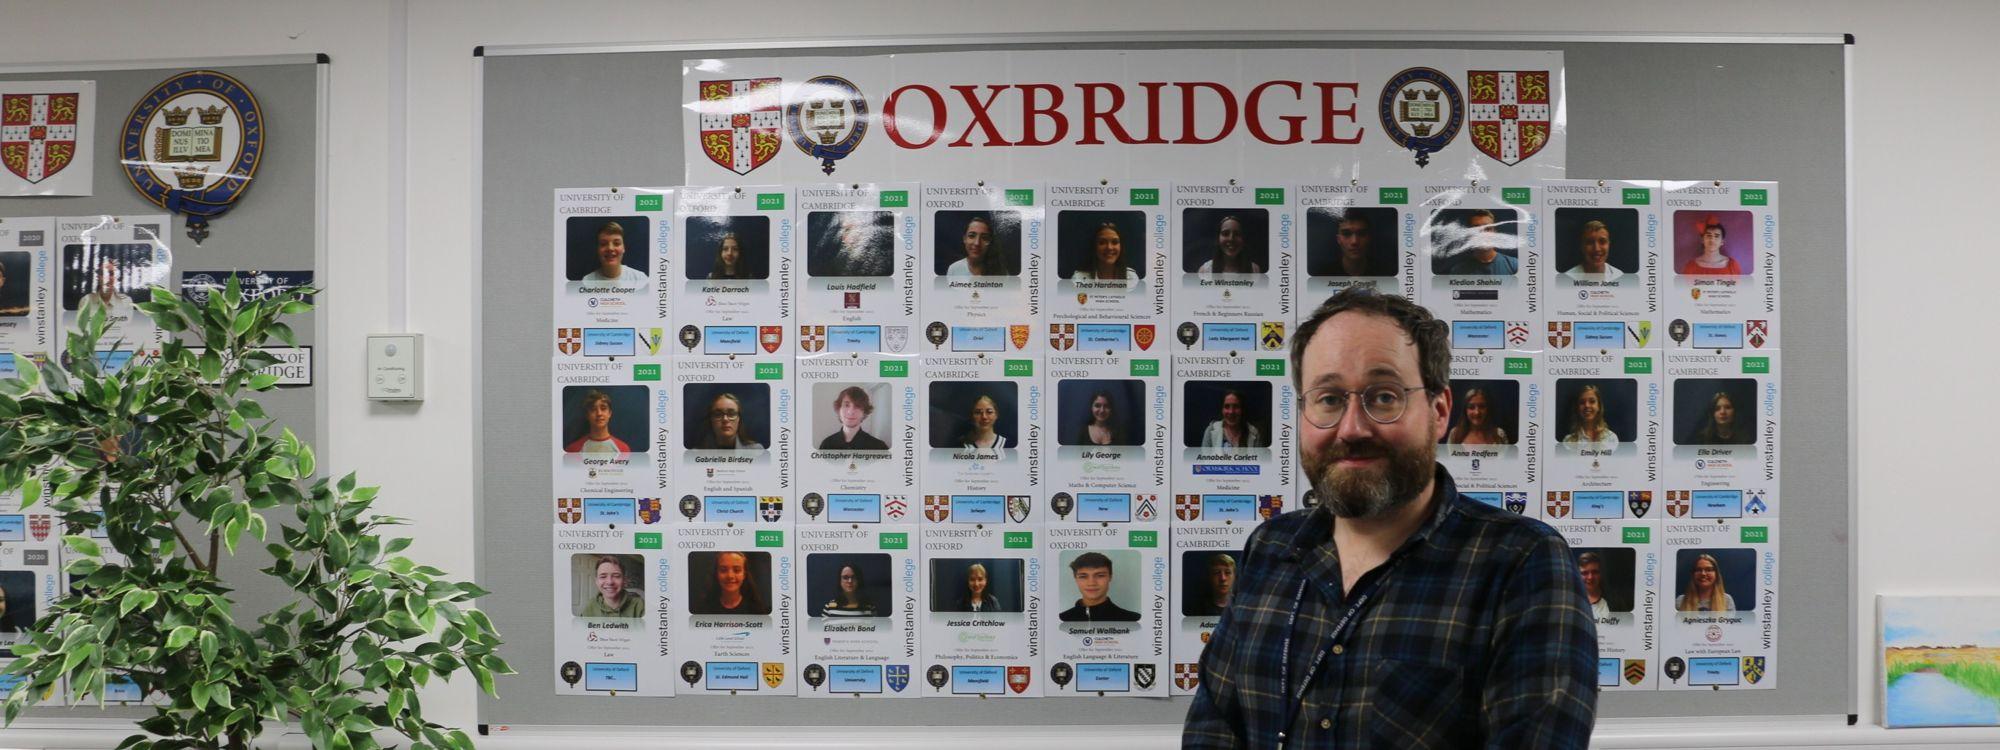 Matt Oxbridge